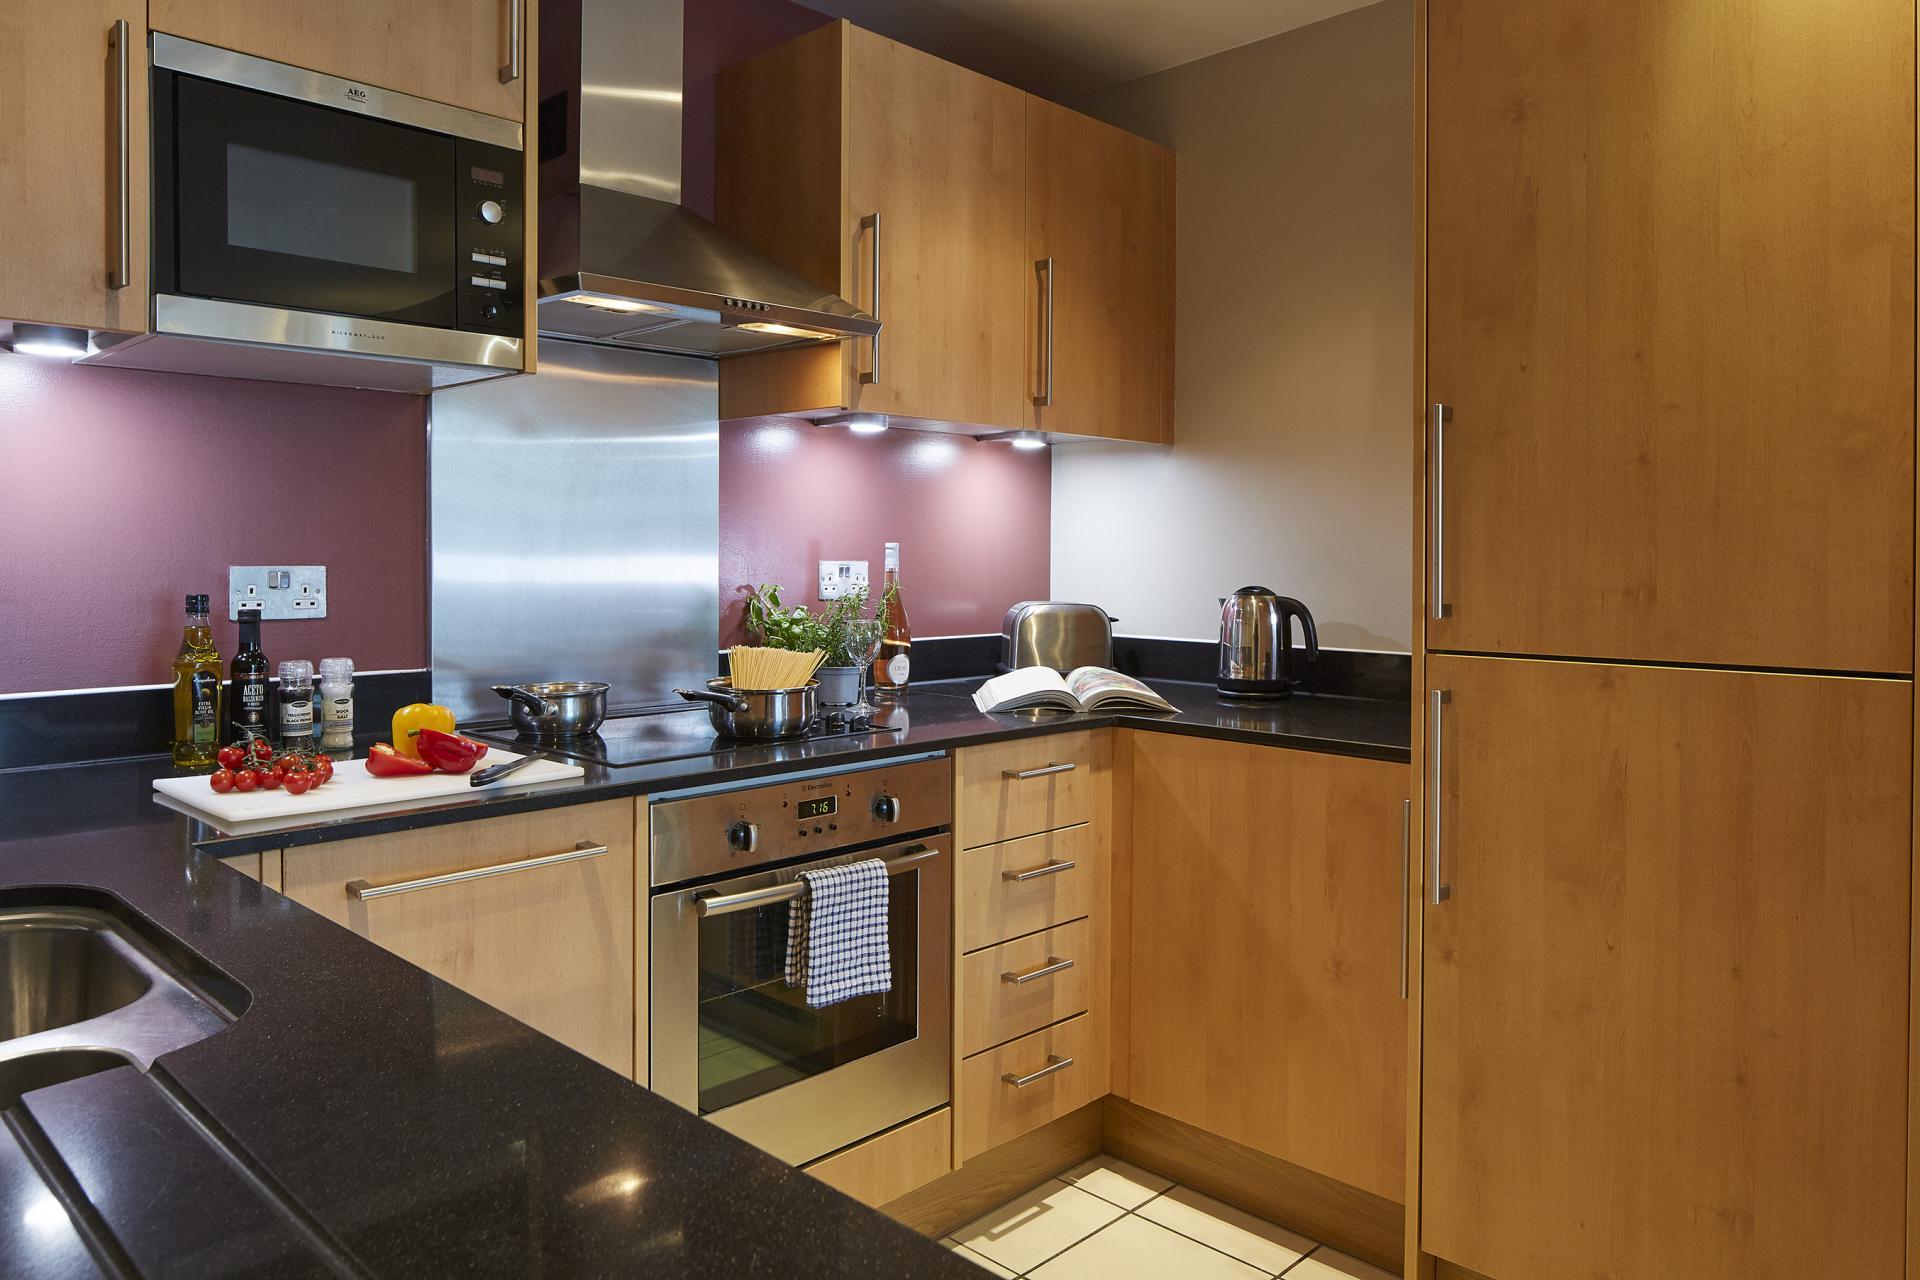 Kitchen at Empire Square Apartments, London Bridge, London - Citybase Apartments